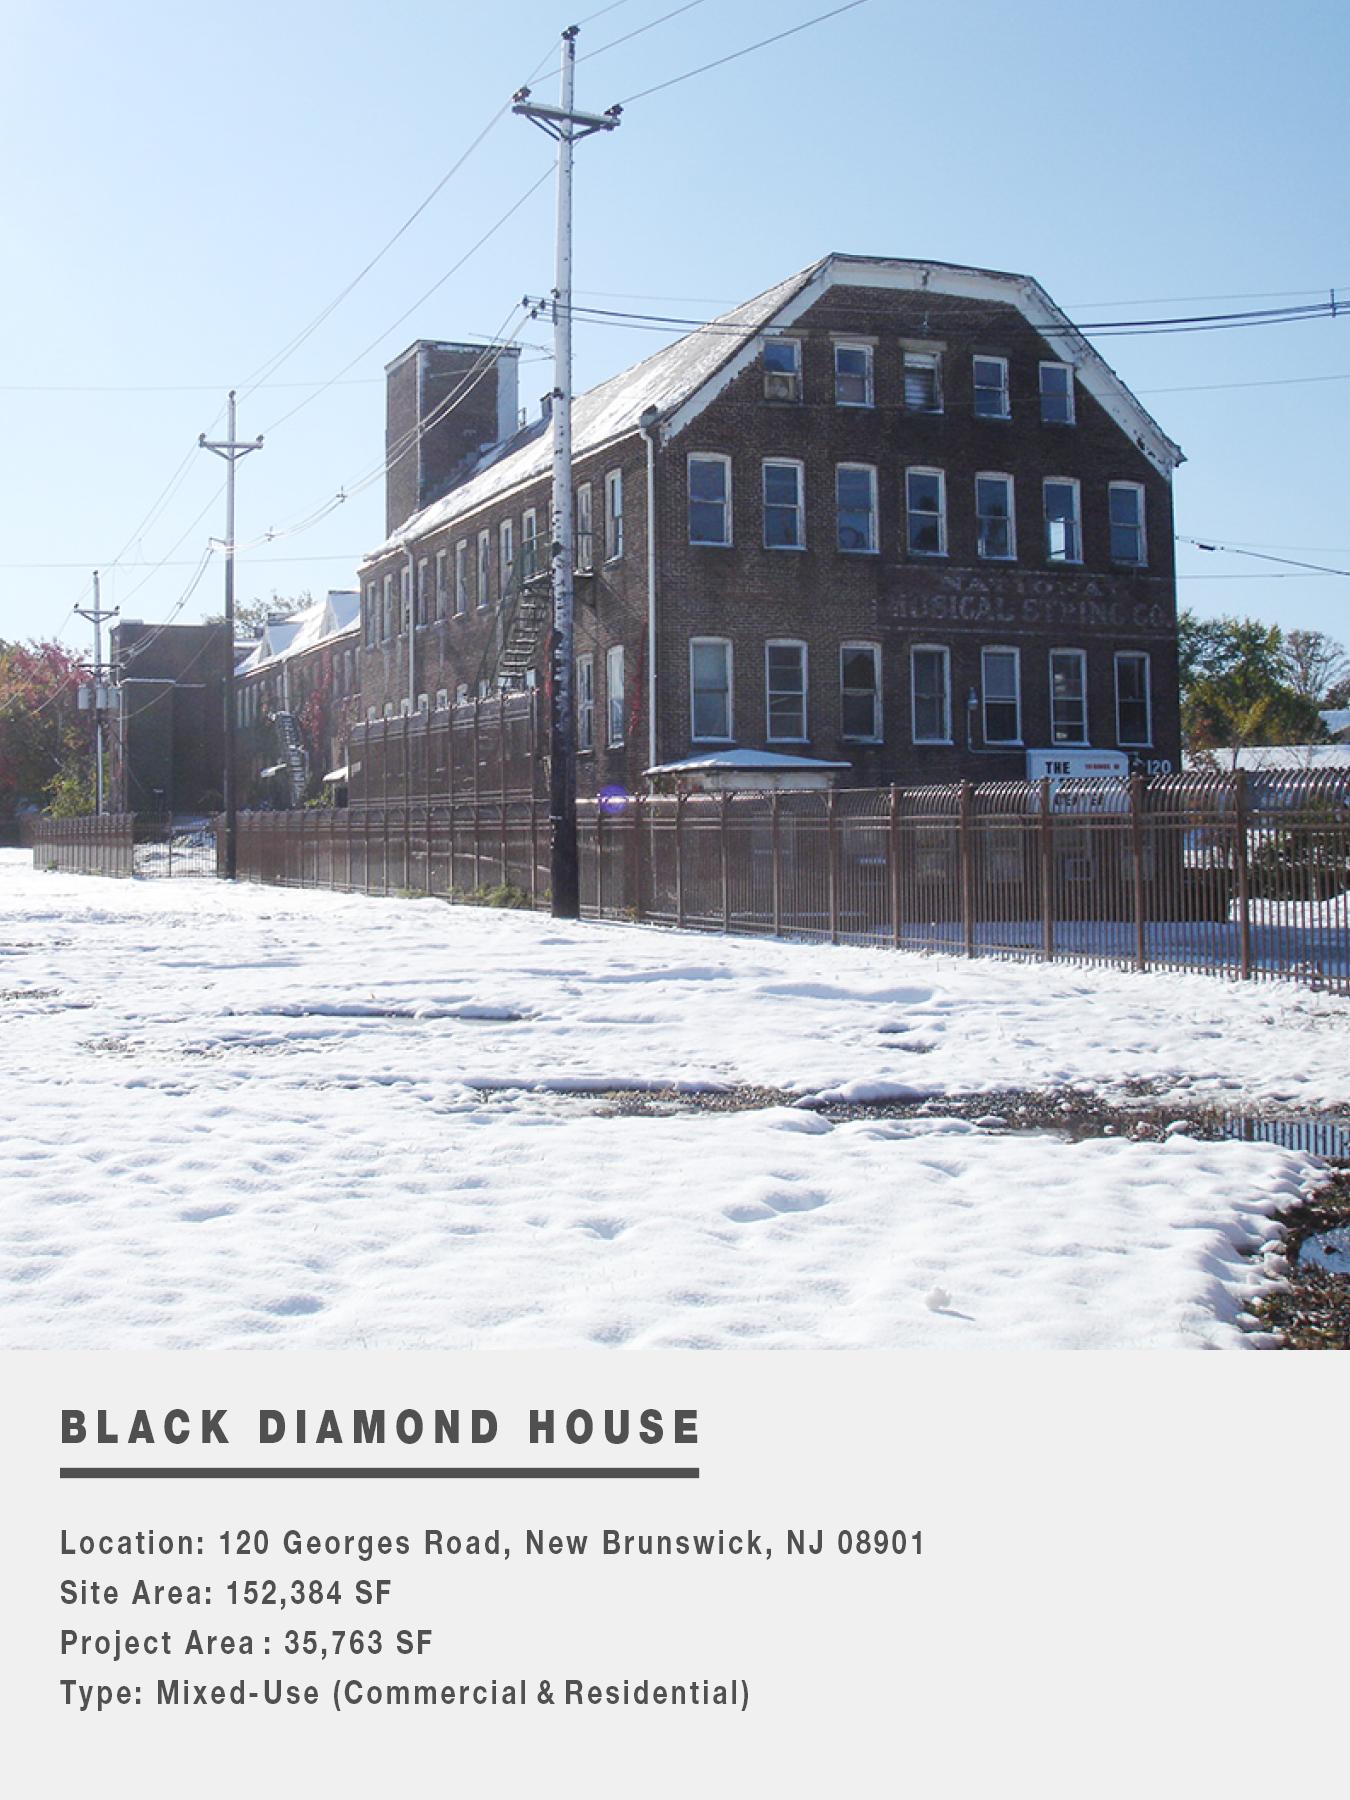 BLACK DIAMOND HOUSE